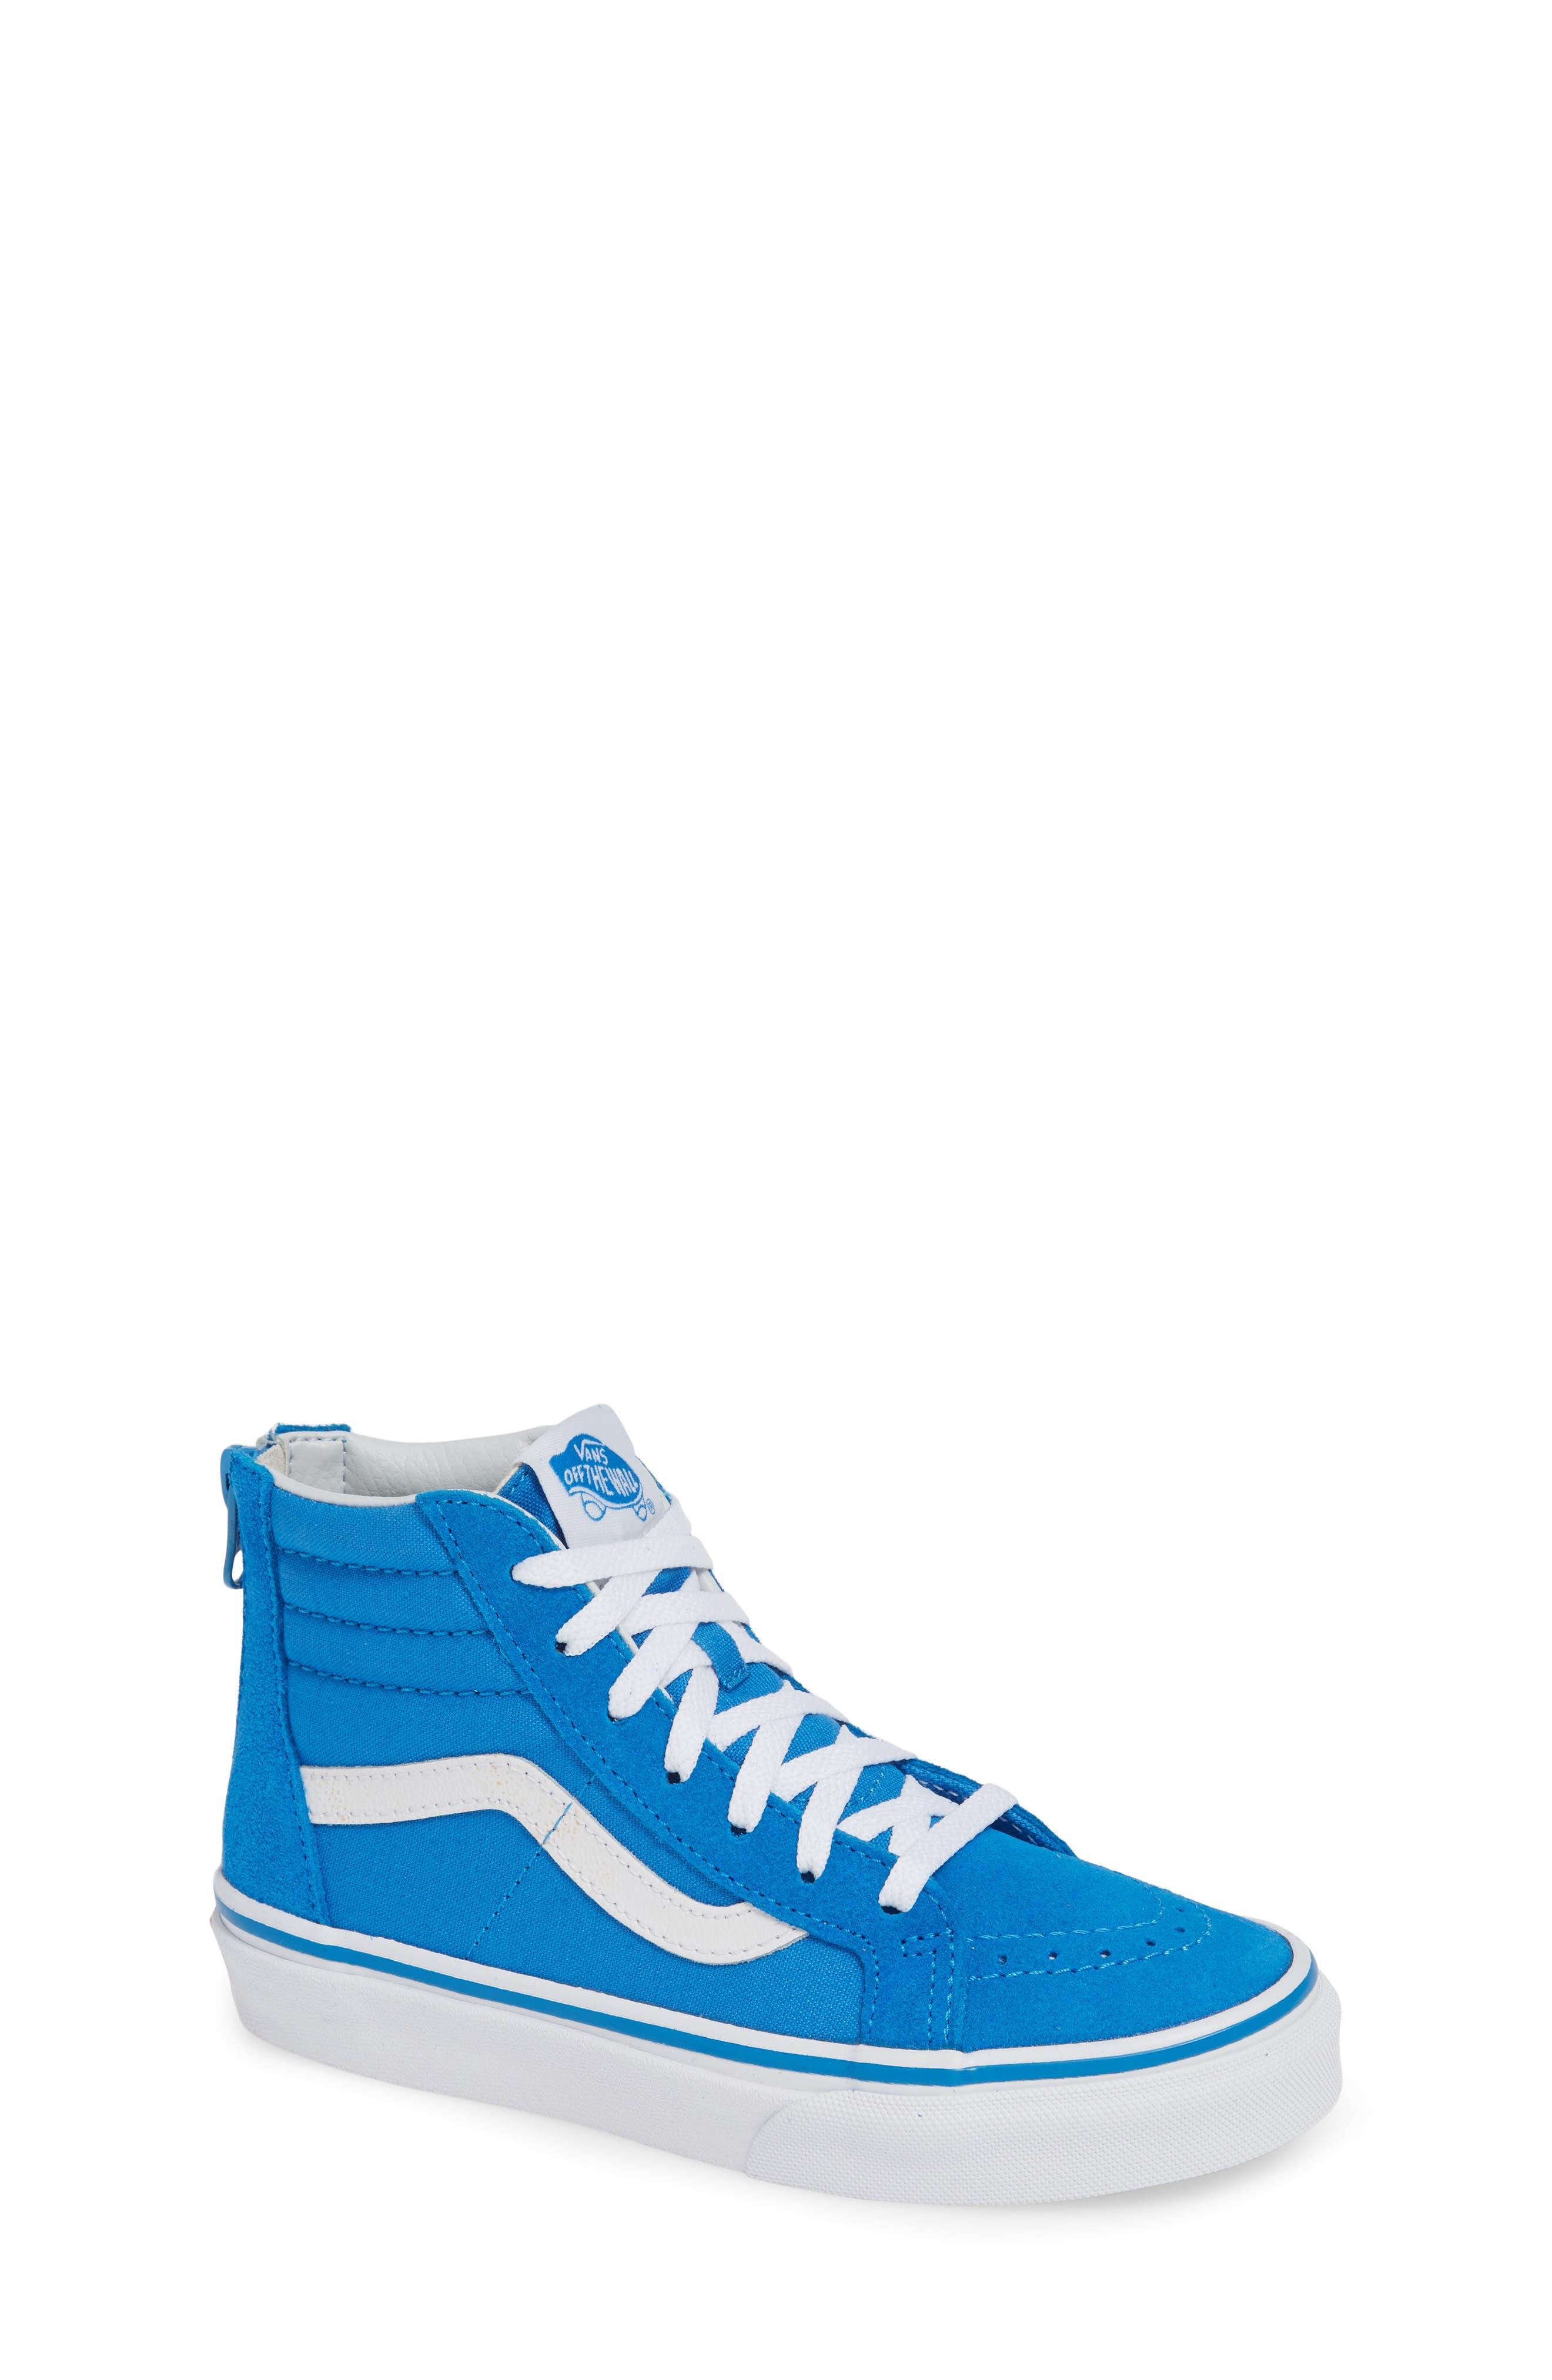 VANS 'Sk8-Hi' Sneaker, Main, color, INDIGO BUNTING/ TRUE WHITE